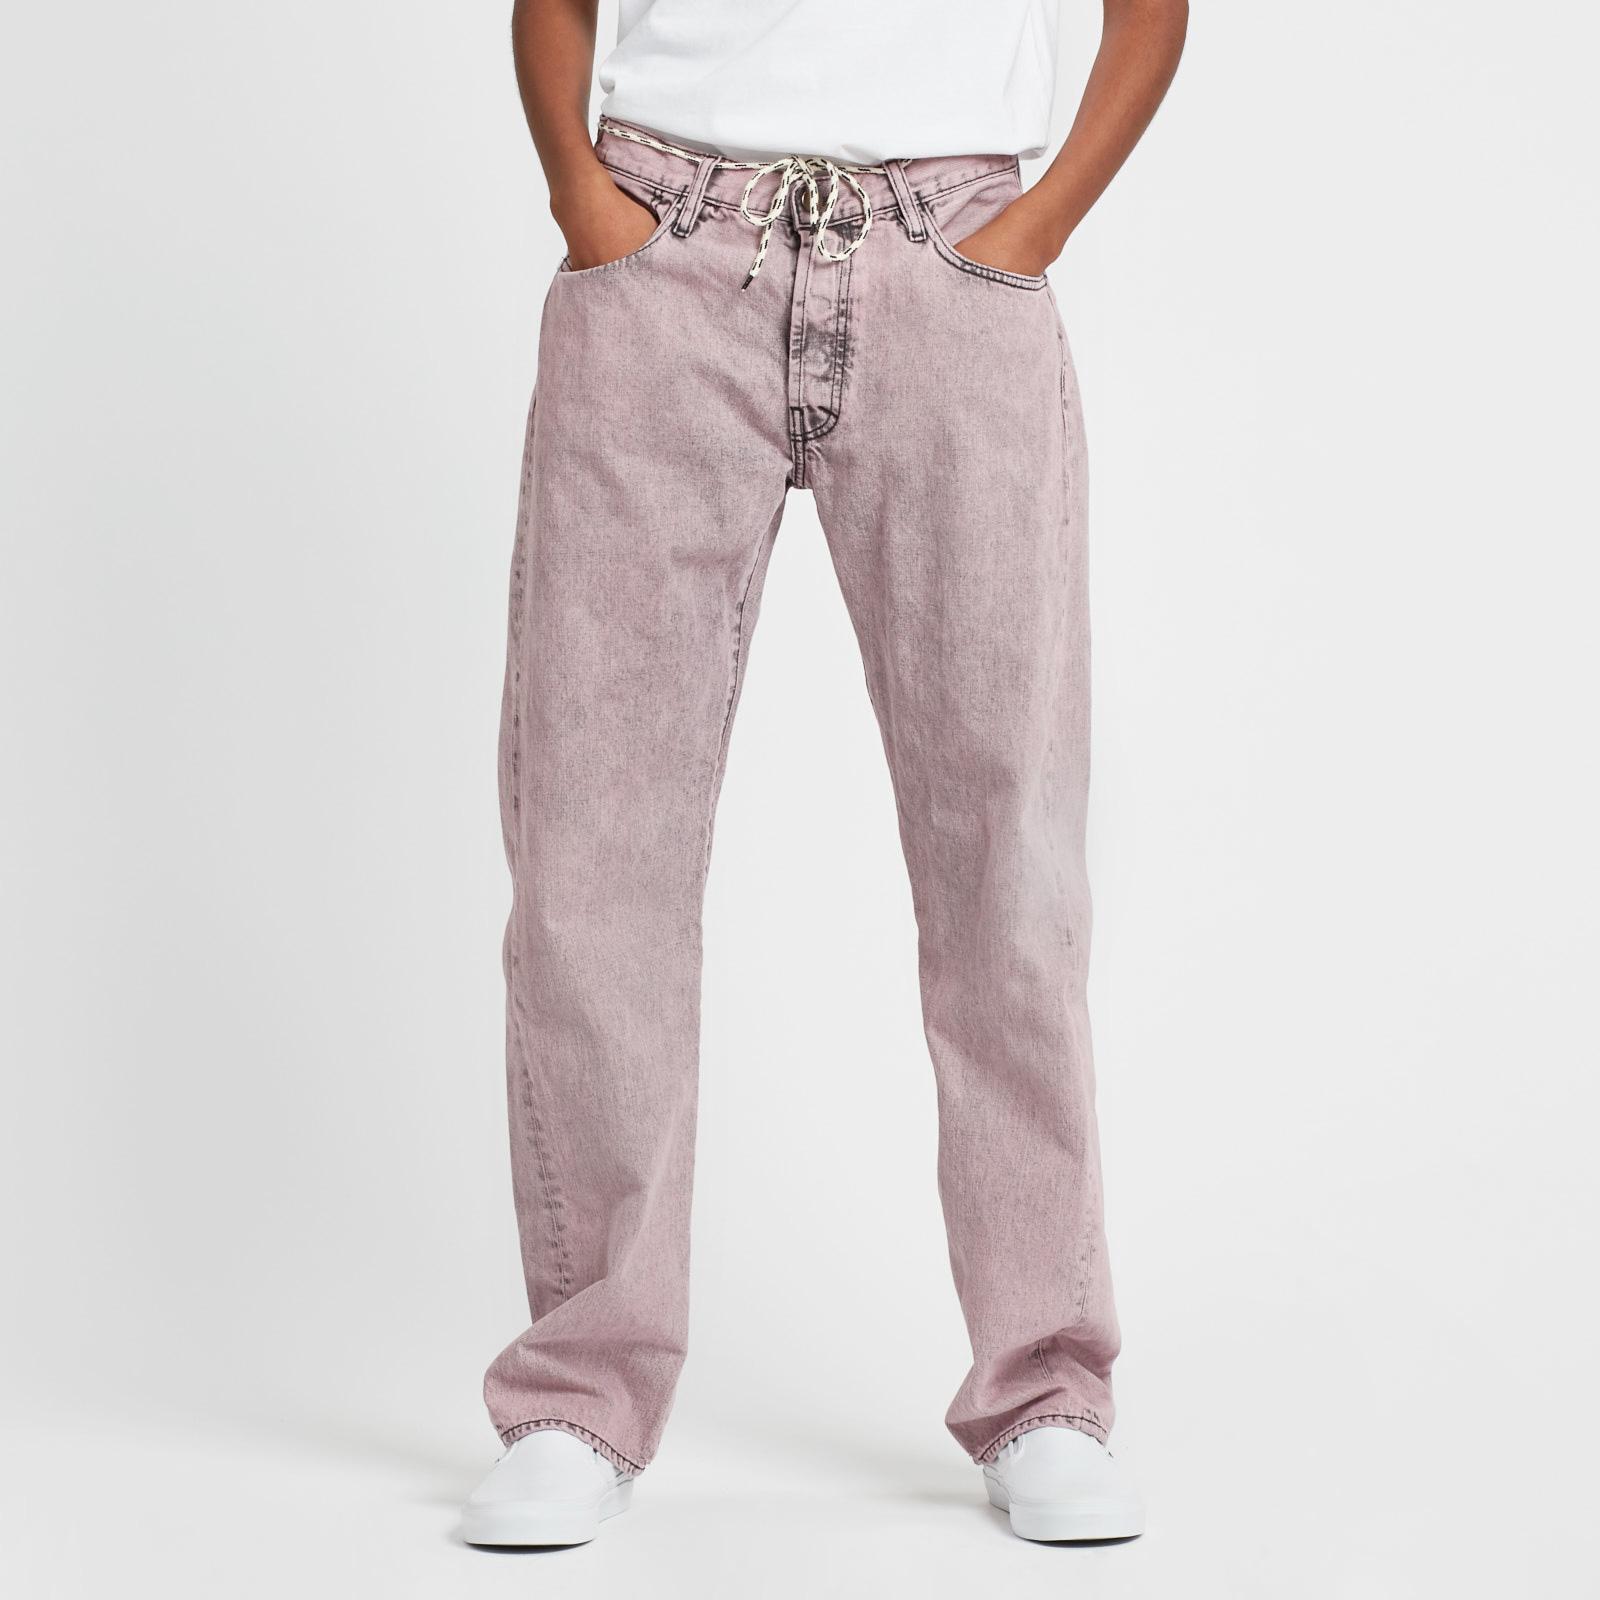 b517c3f73b3fe0 Aries Lilly Aceed Jeans - Soar30501 - Sneakersnstuff | sneakers ...